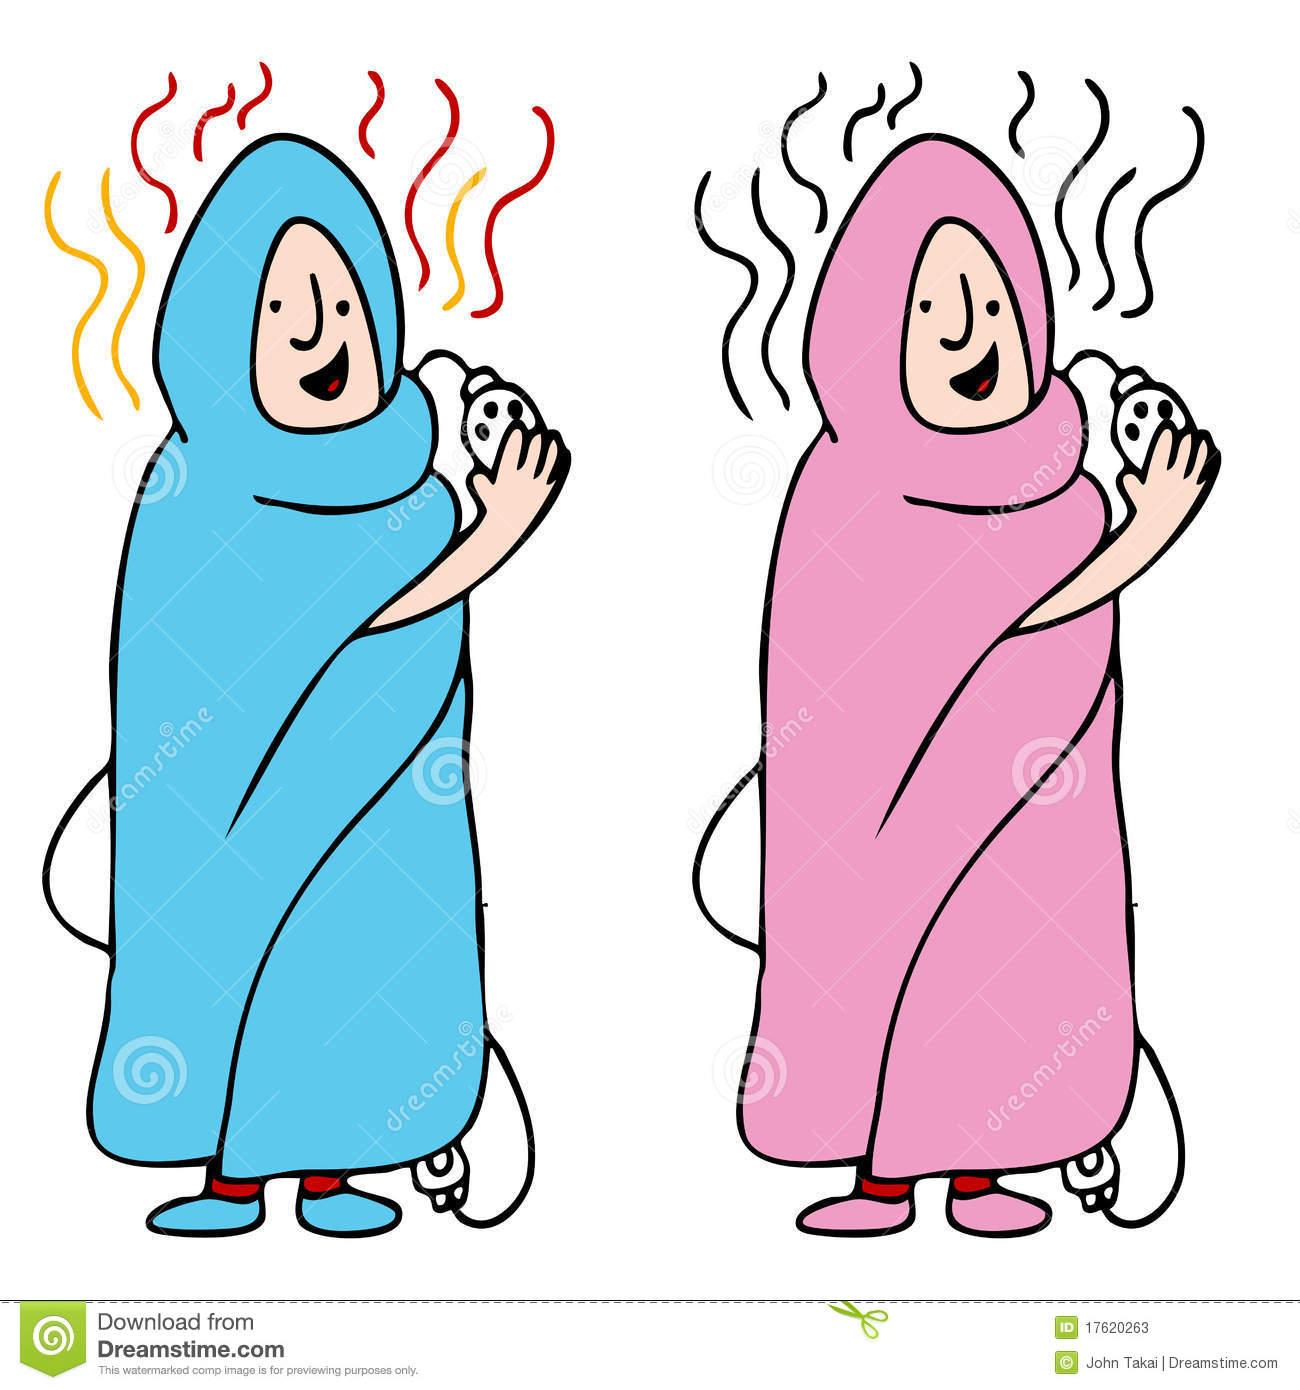 Blanket clipart warm blanket, Blanket warm blanket.